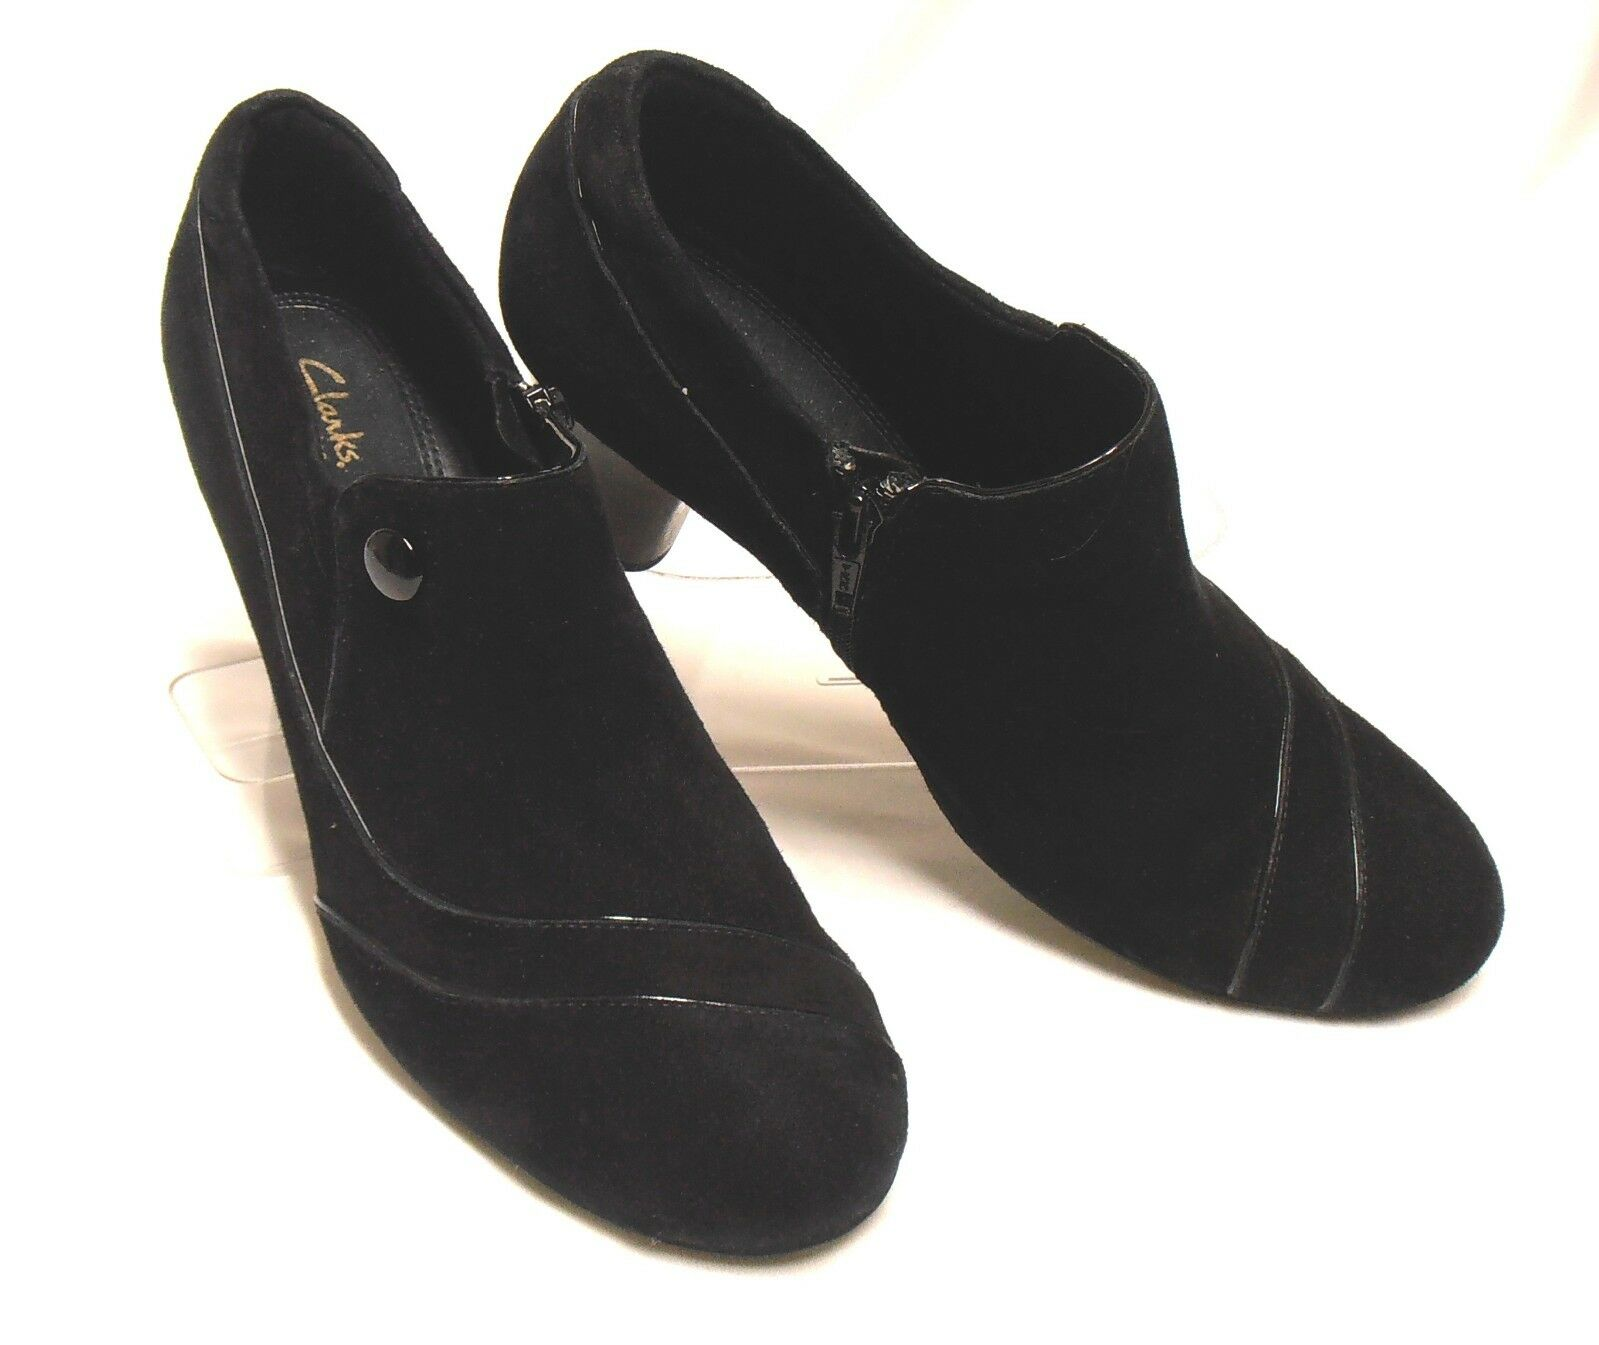 CLARKS Size 10 M Black Suede Leather High-Heel Side-Zip Detailed Dress Booties